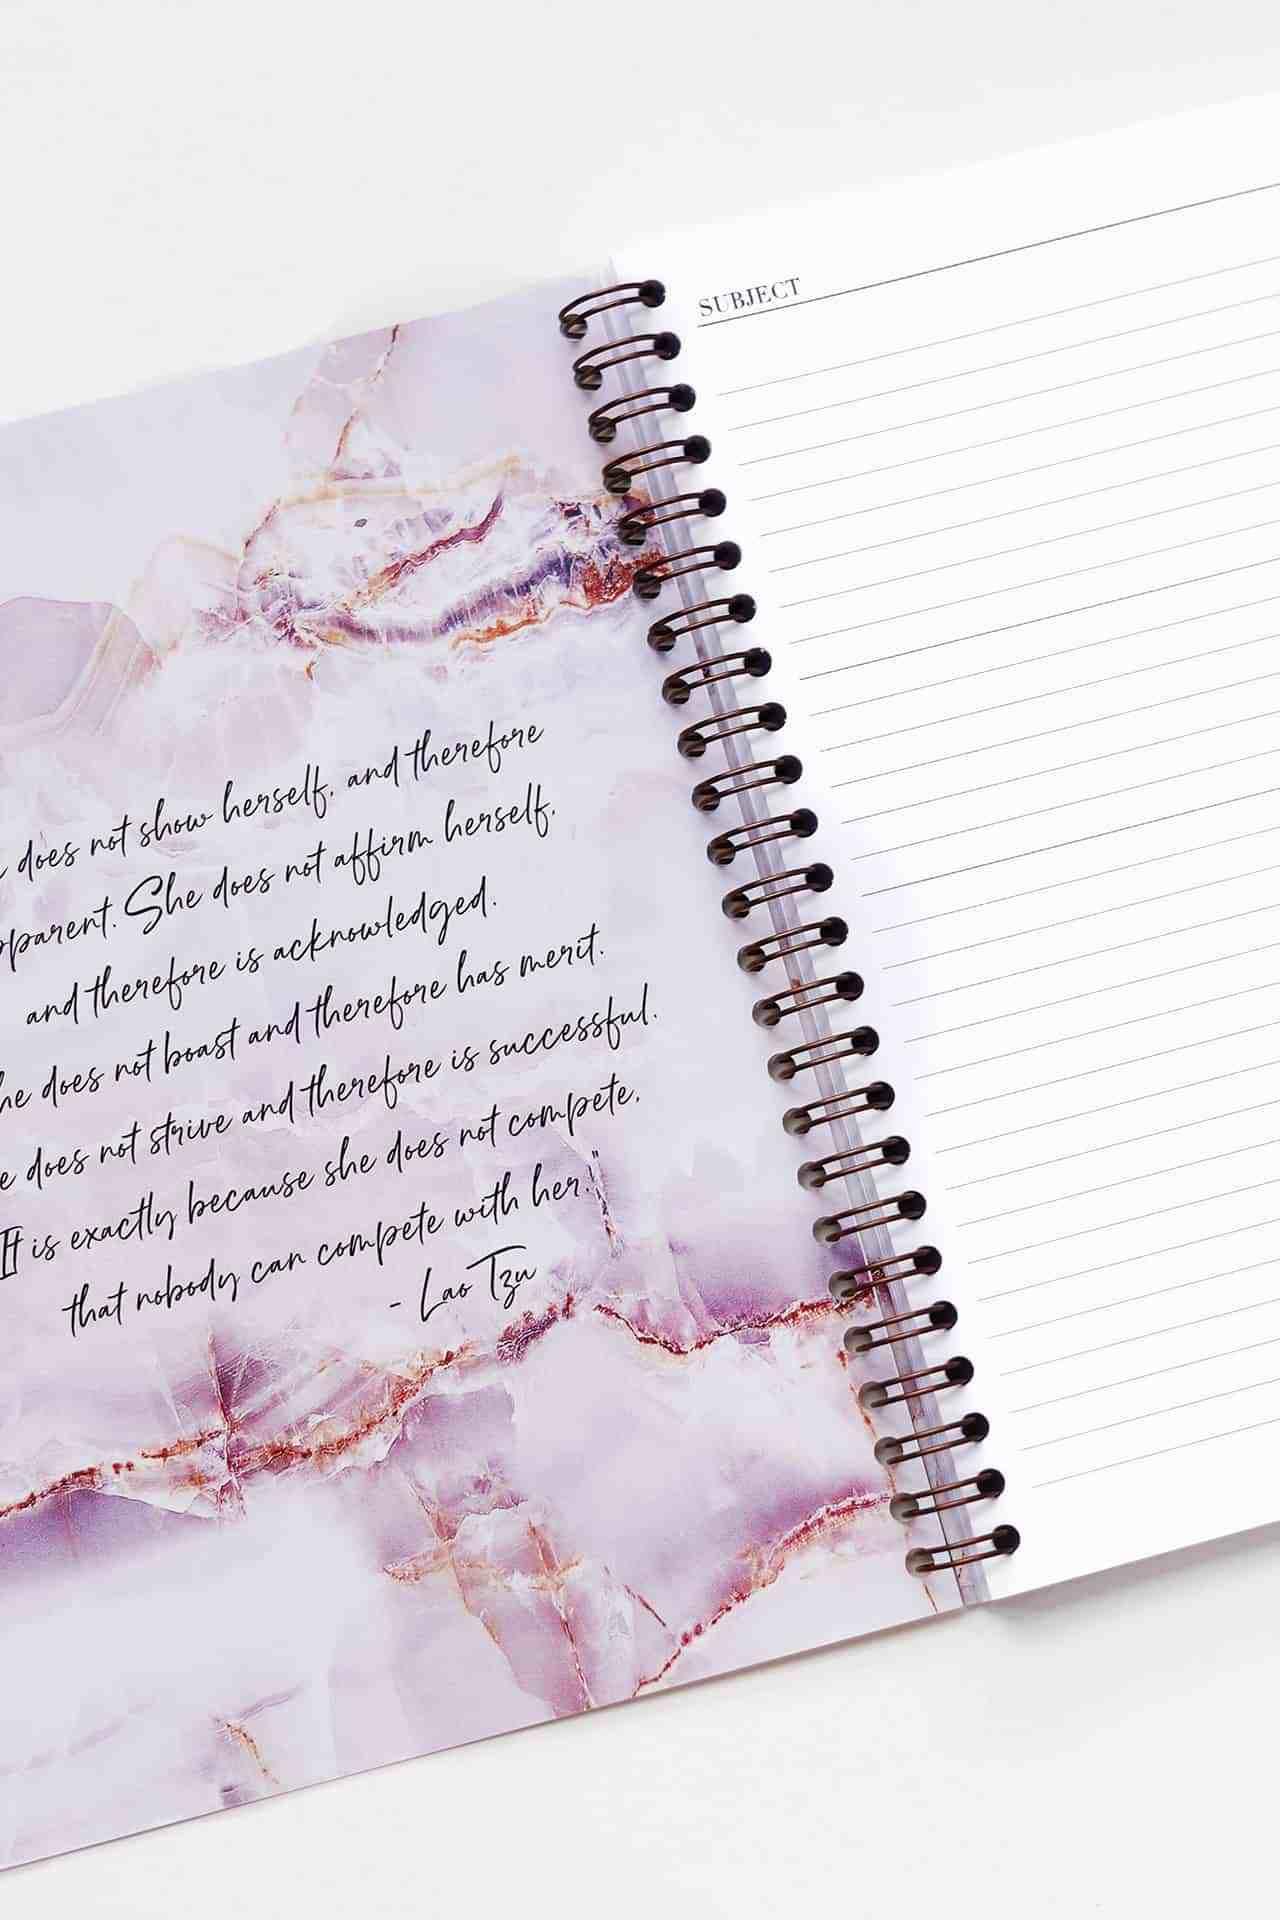 A5 Spiral Notebook in Luxurious Amethyst